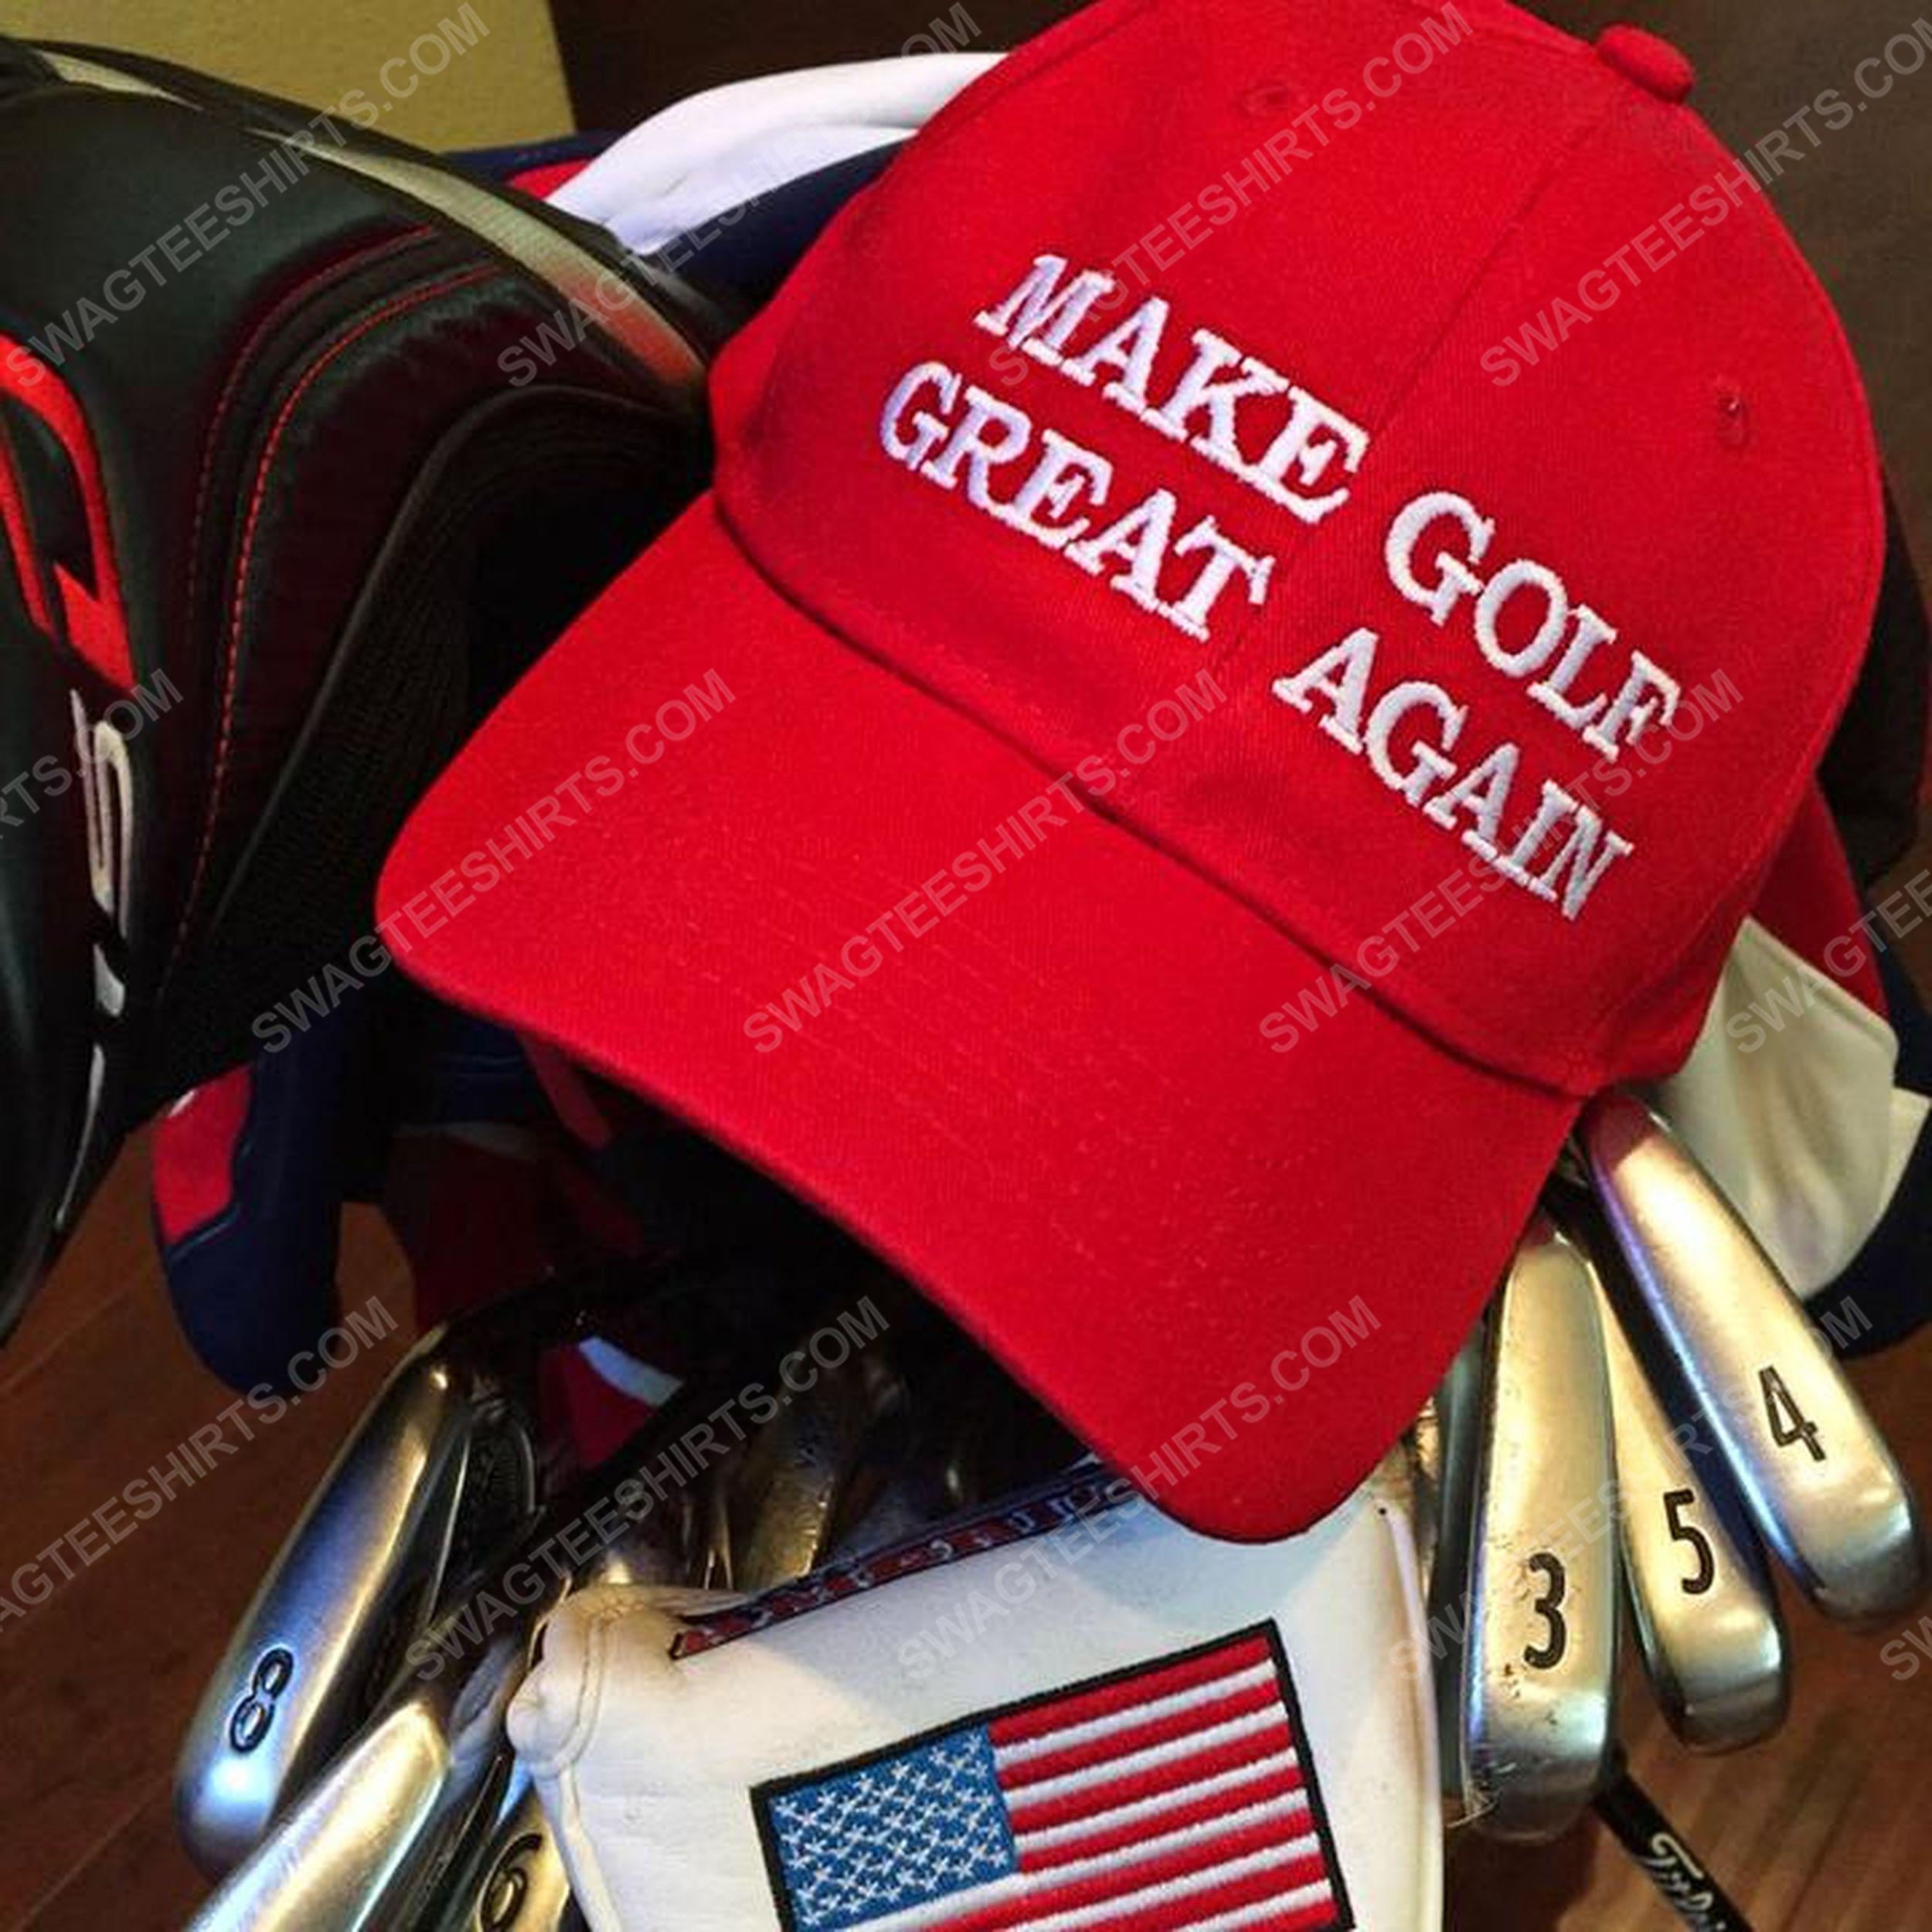 Make golf great again full print classic hat 1 - Copy (2)